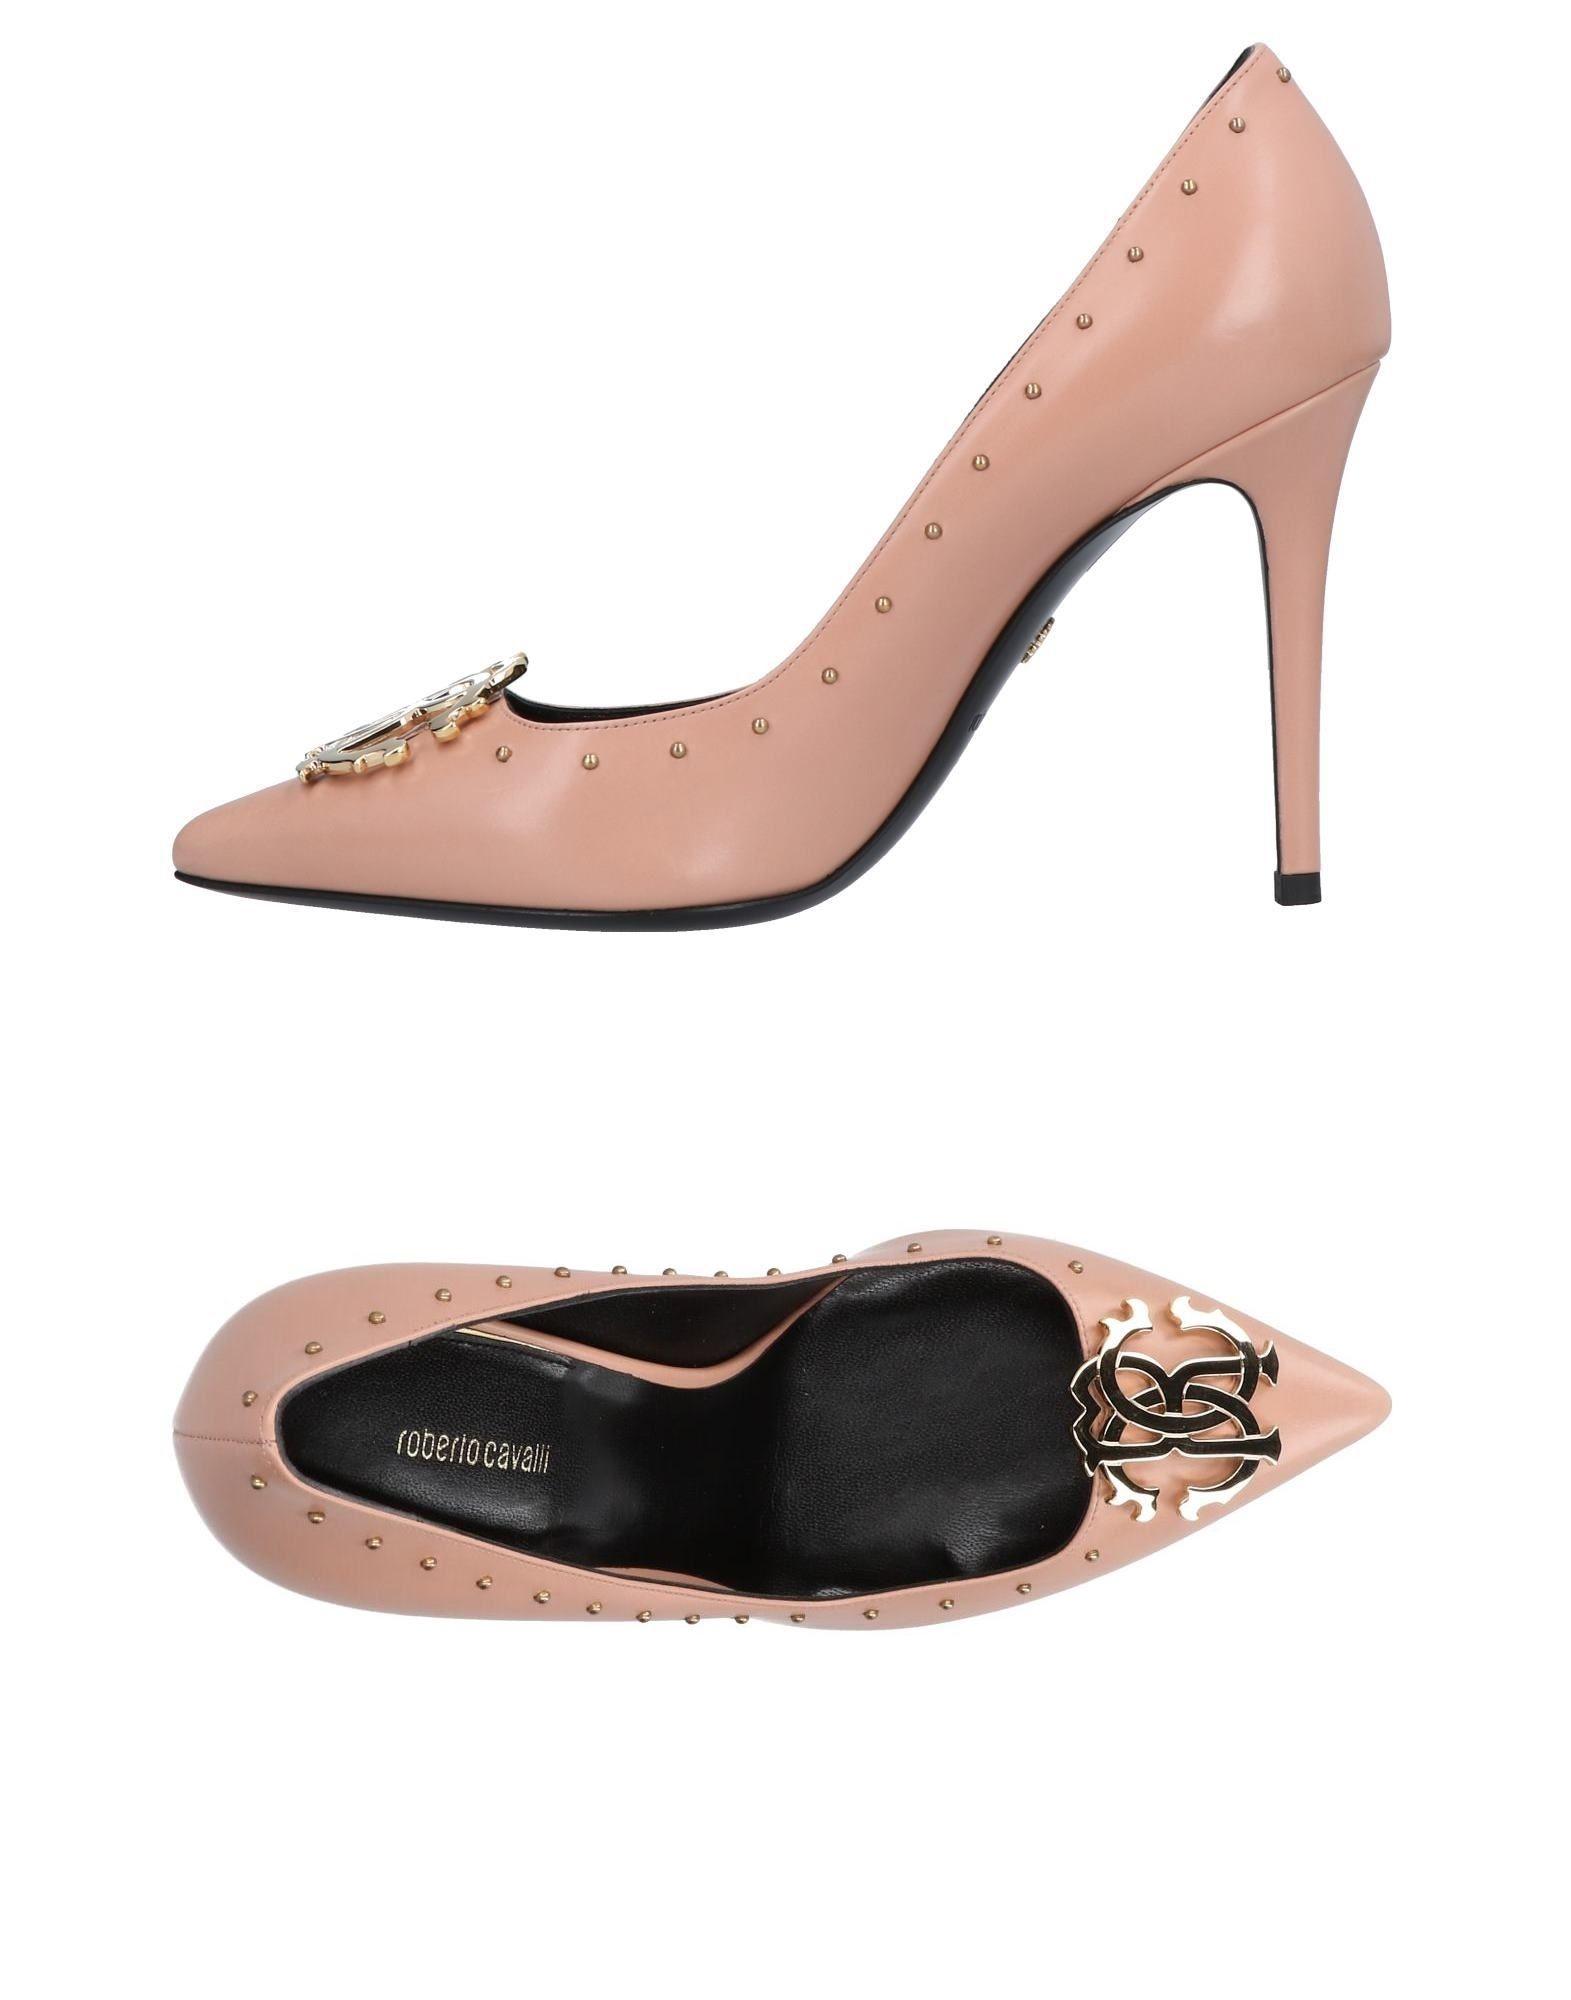 Rabatt Schuhe Roberto Cavalli Pumps Damen  11458895CL